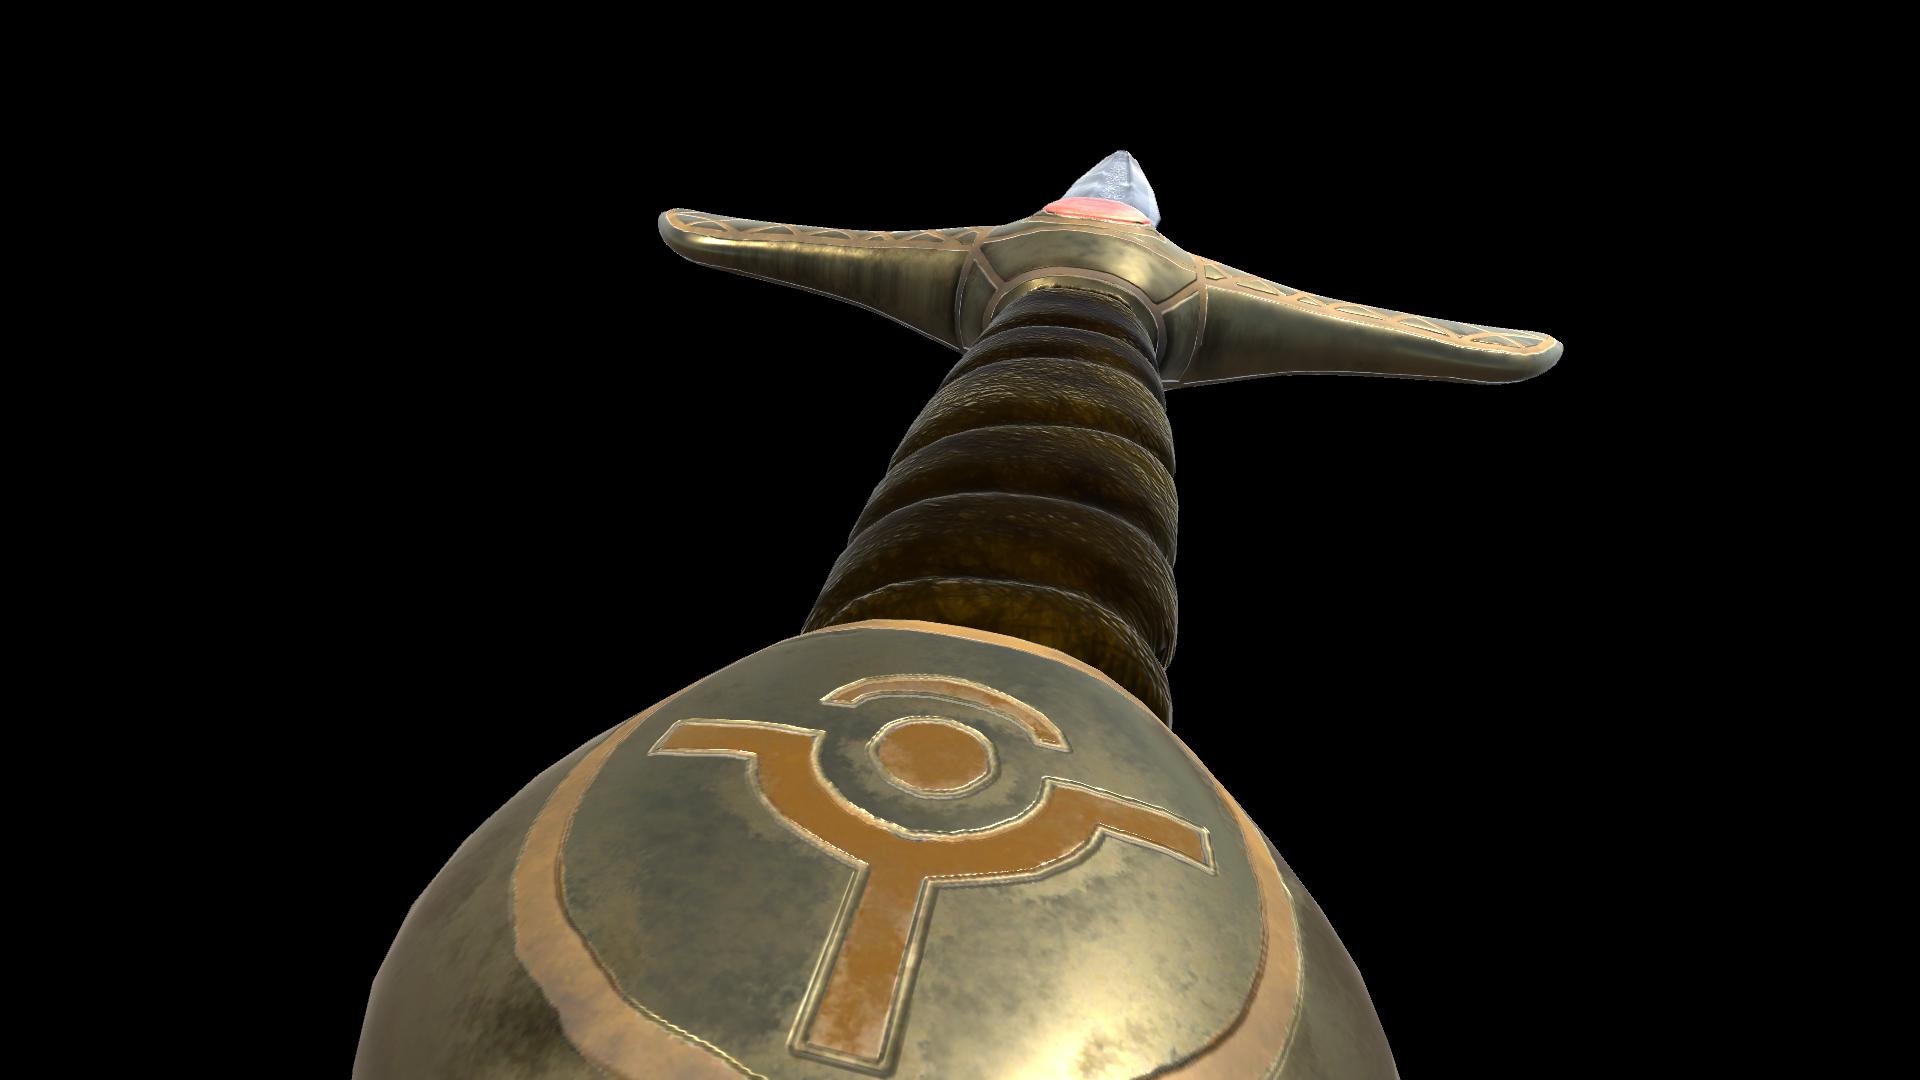 Sword hilt